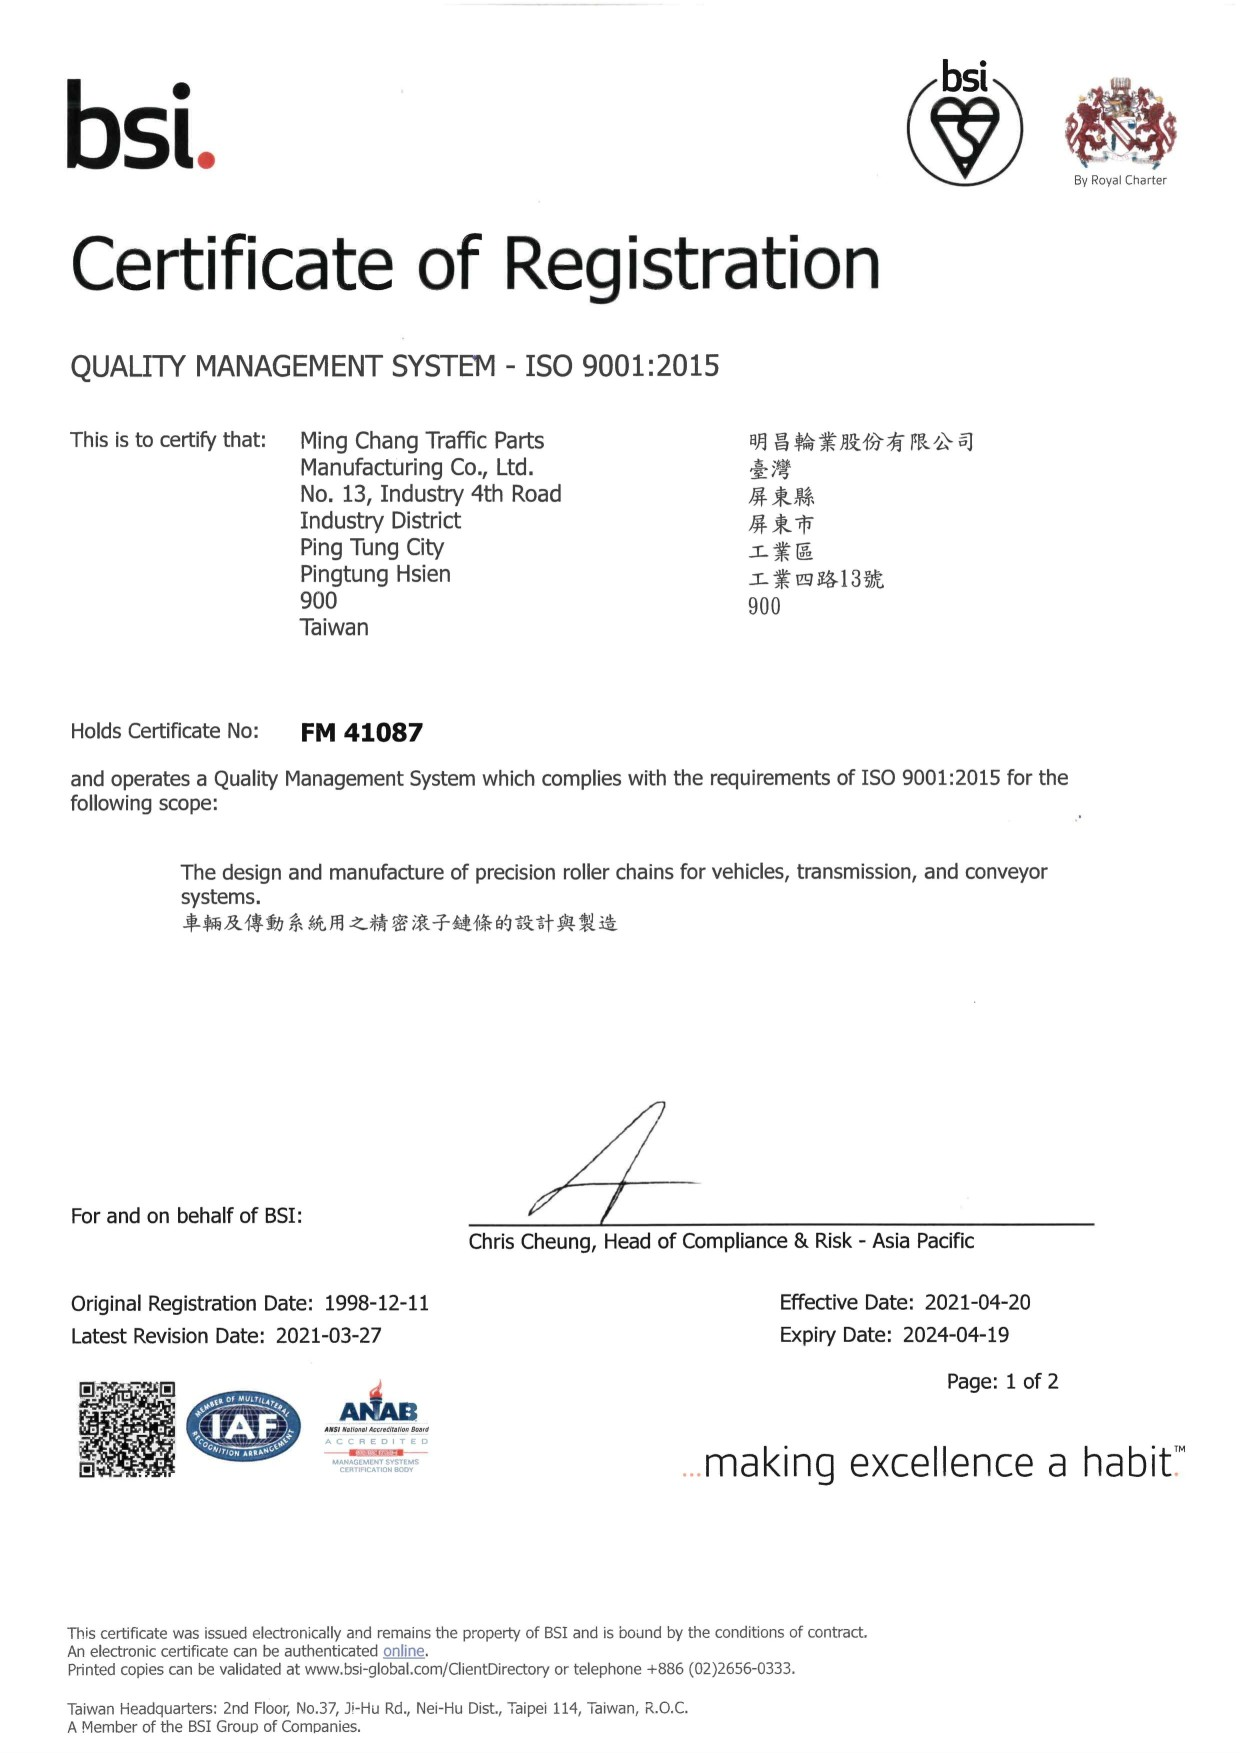 MCC ISO 9001.2015-P1 Certificate